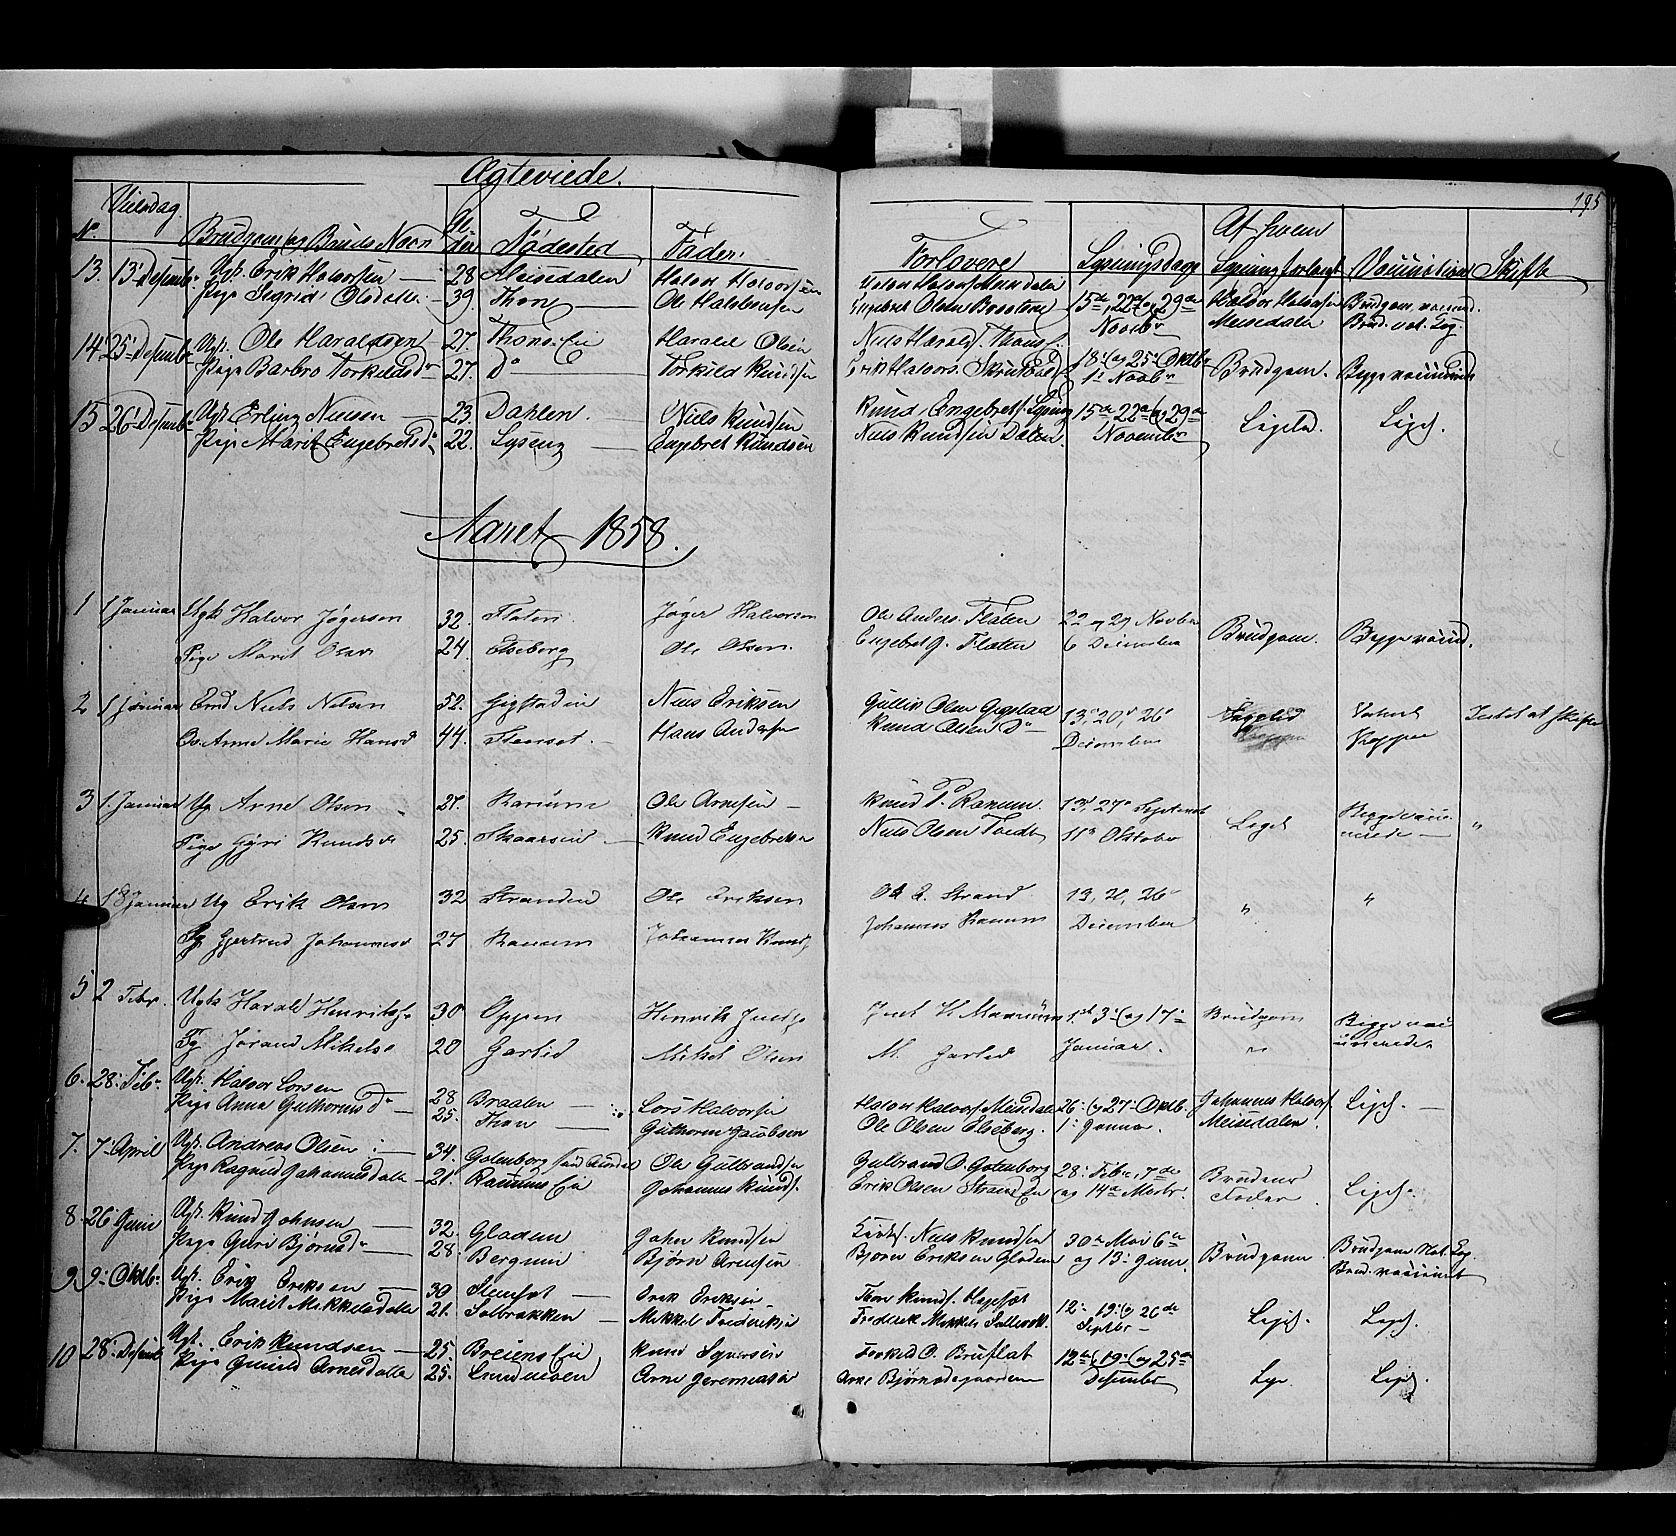 SAH, Nord-Aurdal prestekontor, Ministerialbok nr. 7, 1842-1863, s. 195